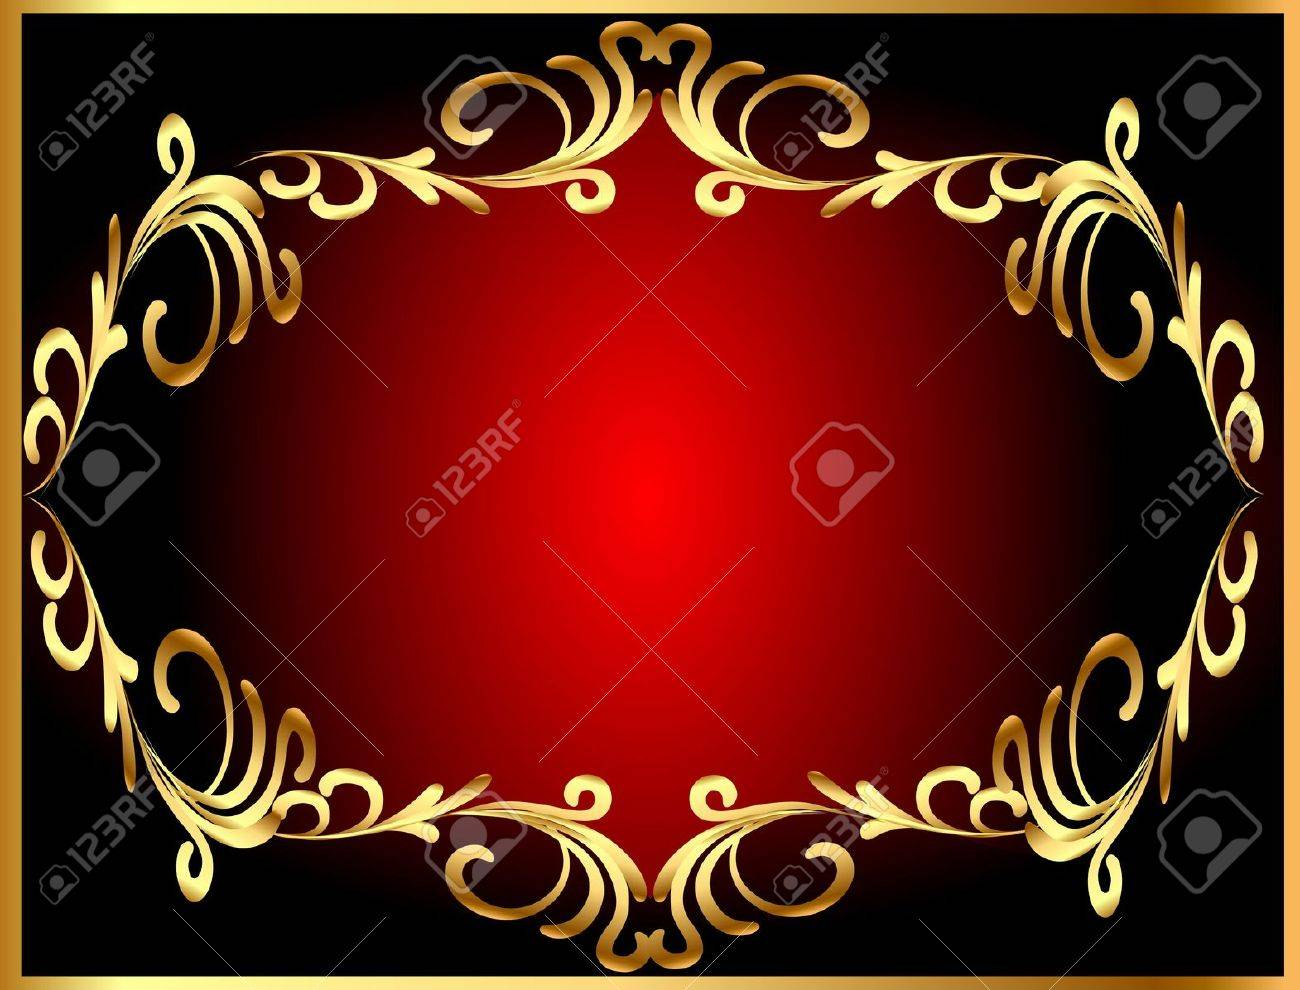 illustration frame background with gold(en) winding pattern Stock Vector - 11929489